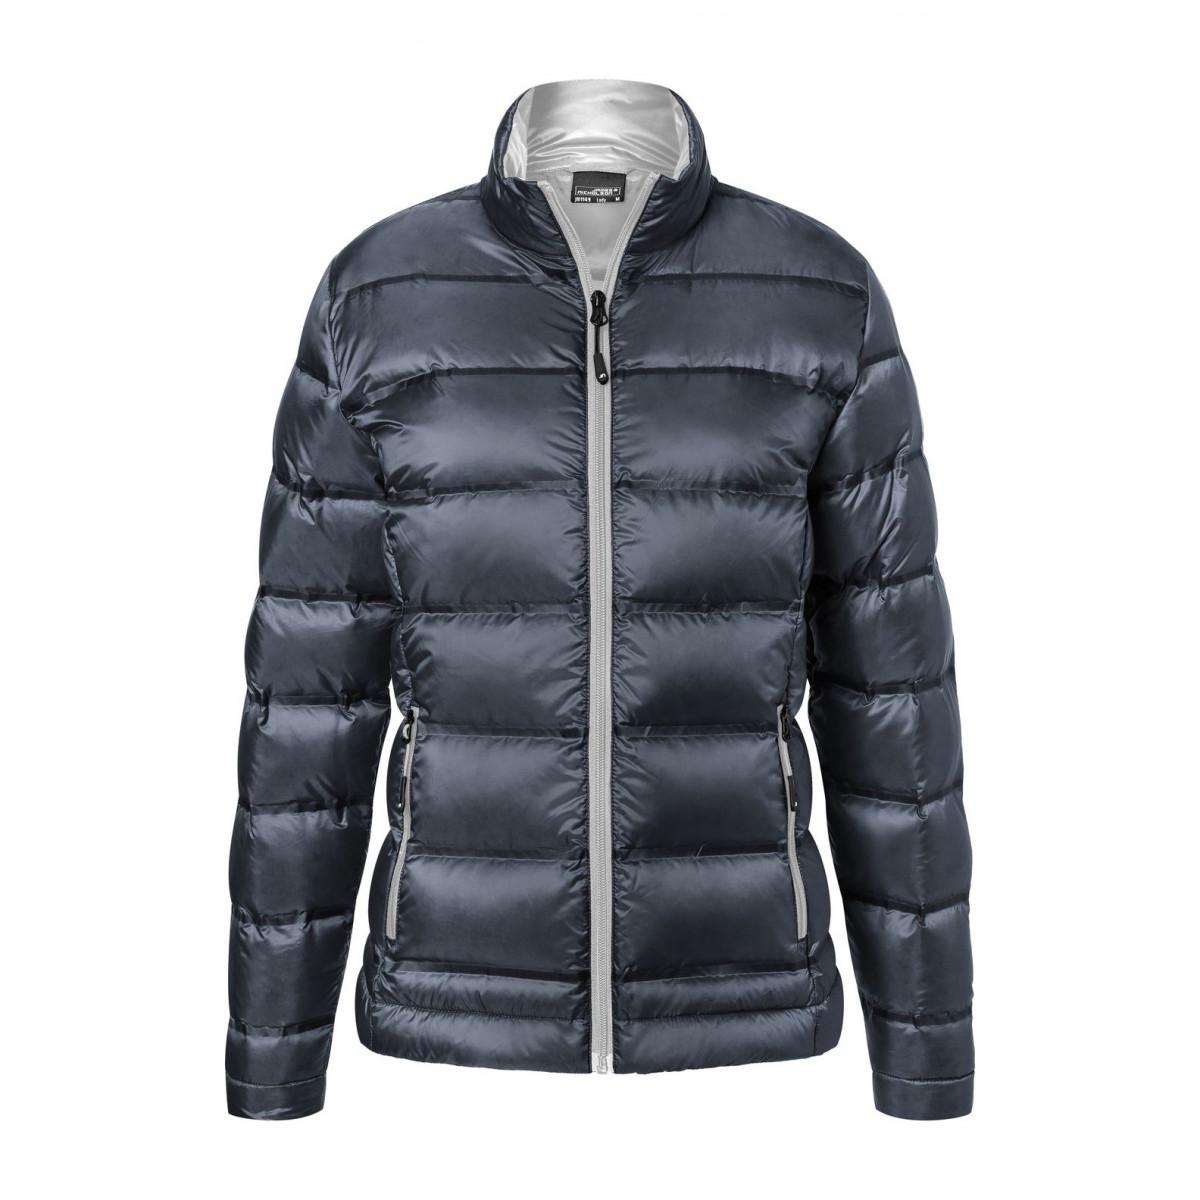 Куртка женская JN1149 Ladies Down Jacket - Темно-синий/Серебряный